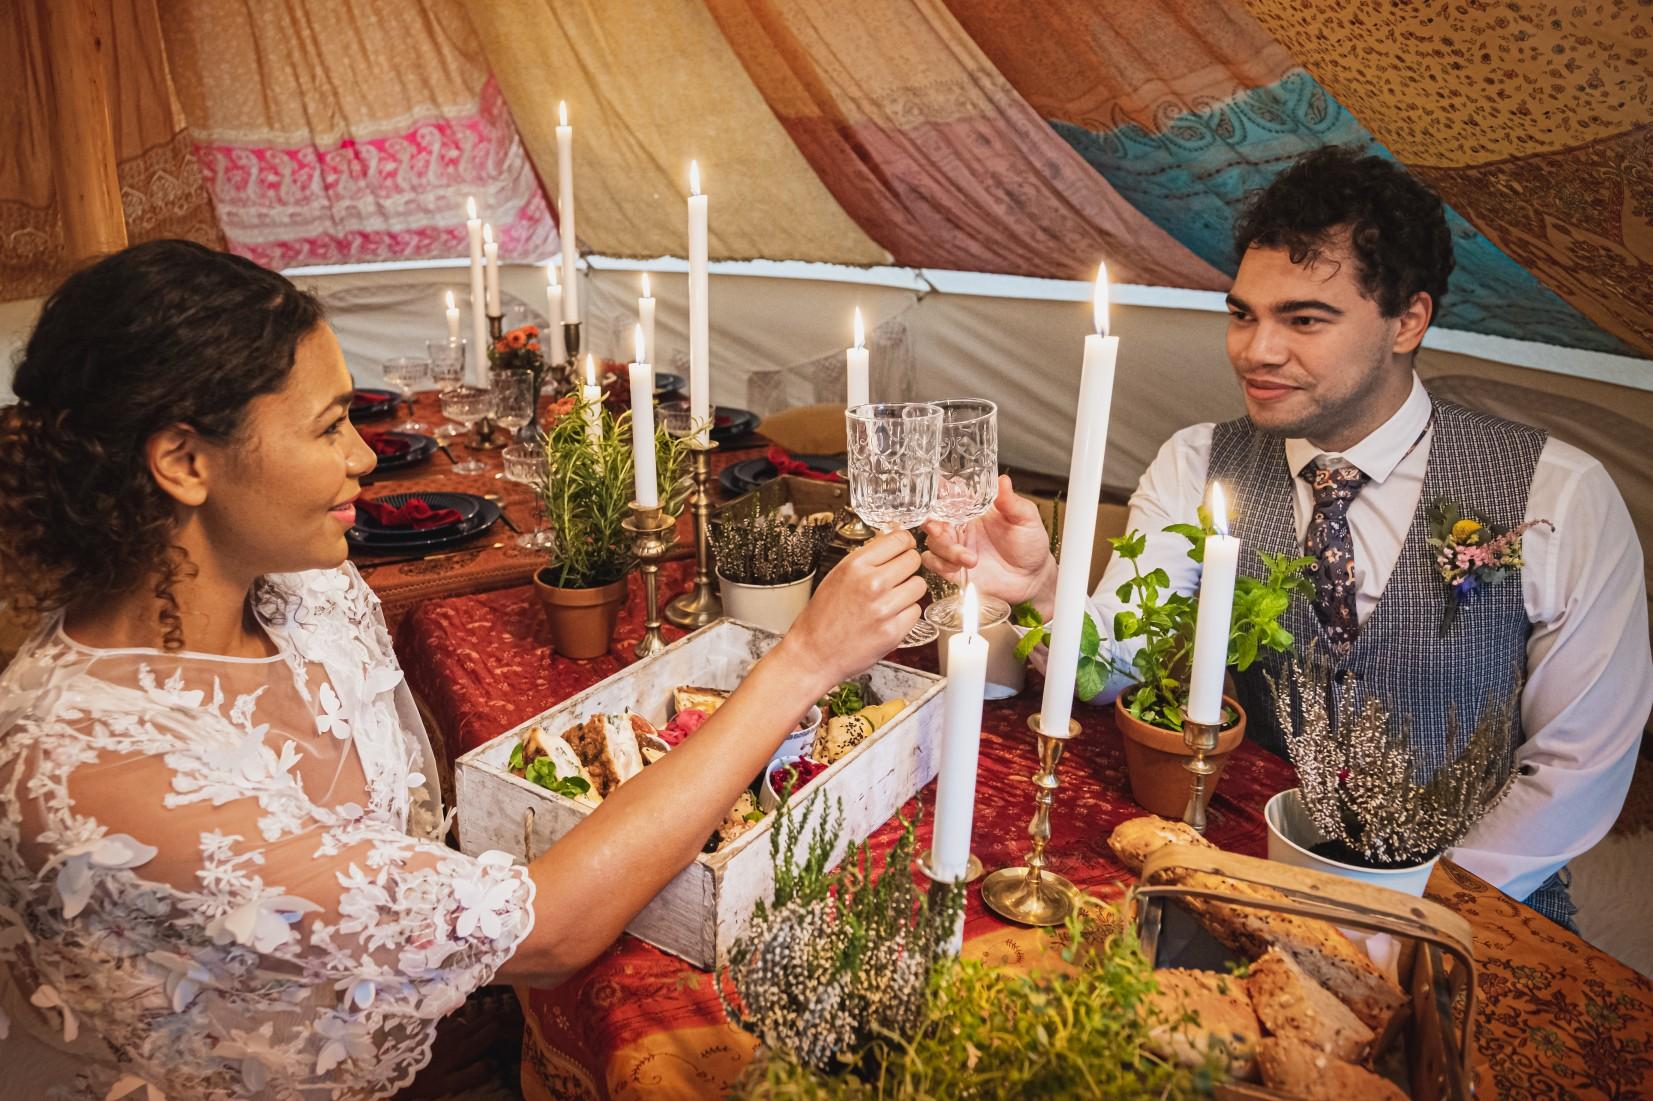 colourful micro wedding at patricks barn - wedding picnic - wedding grazing table - hippie wedding - unconventional wedding